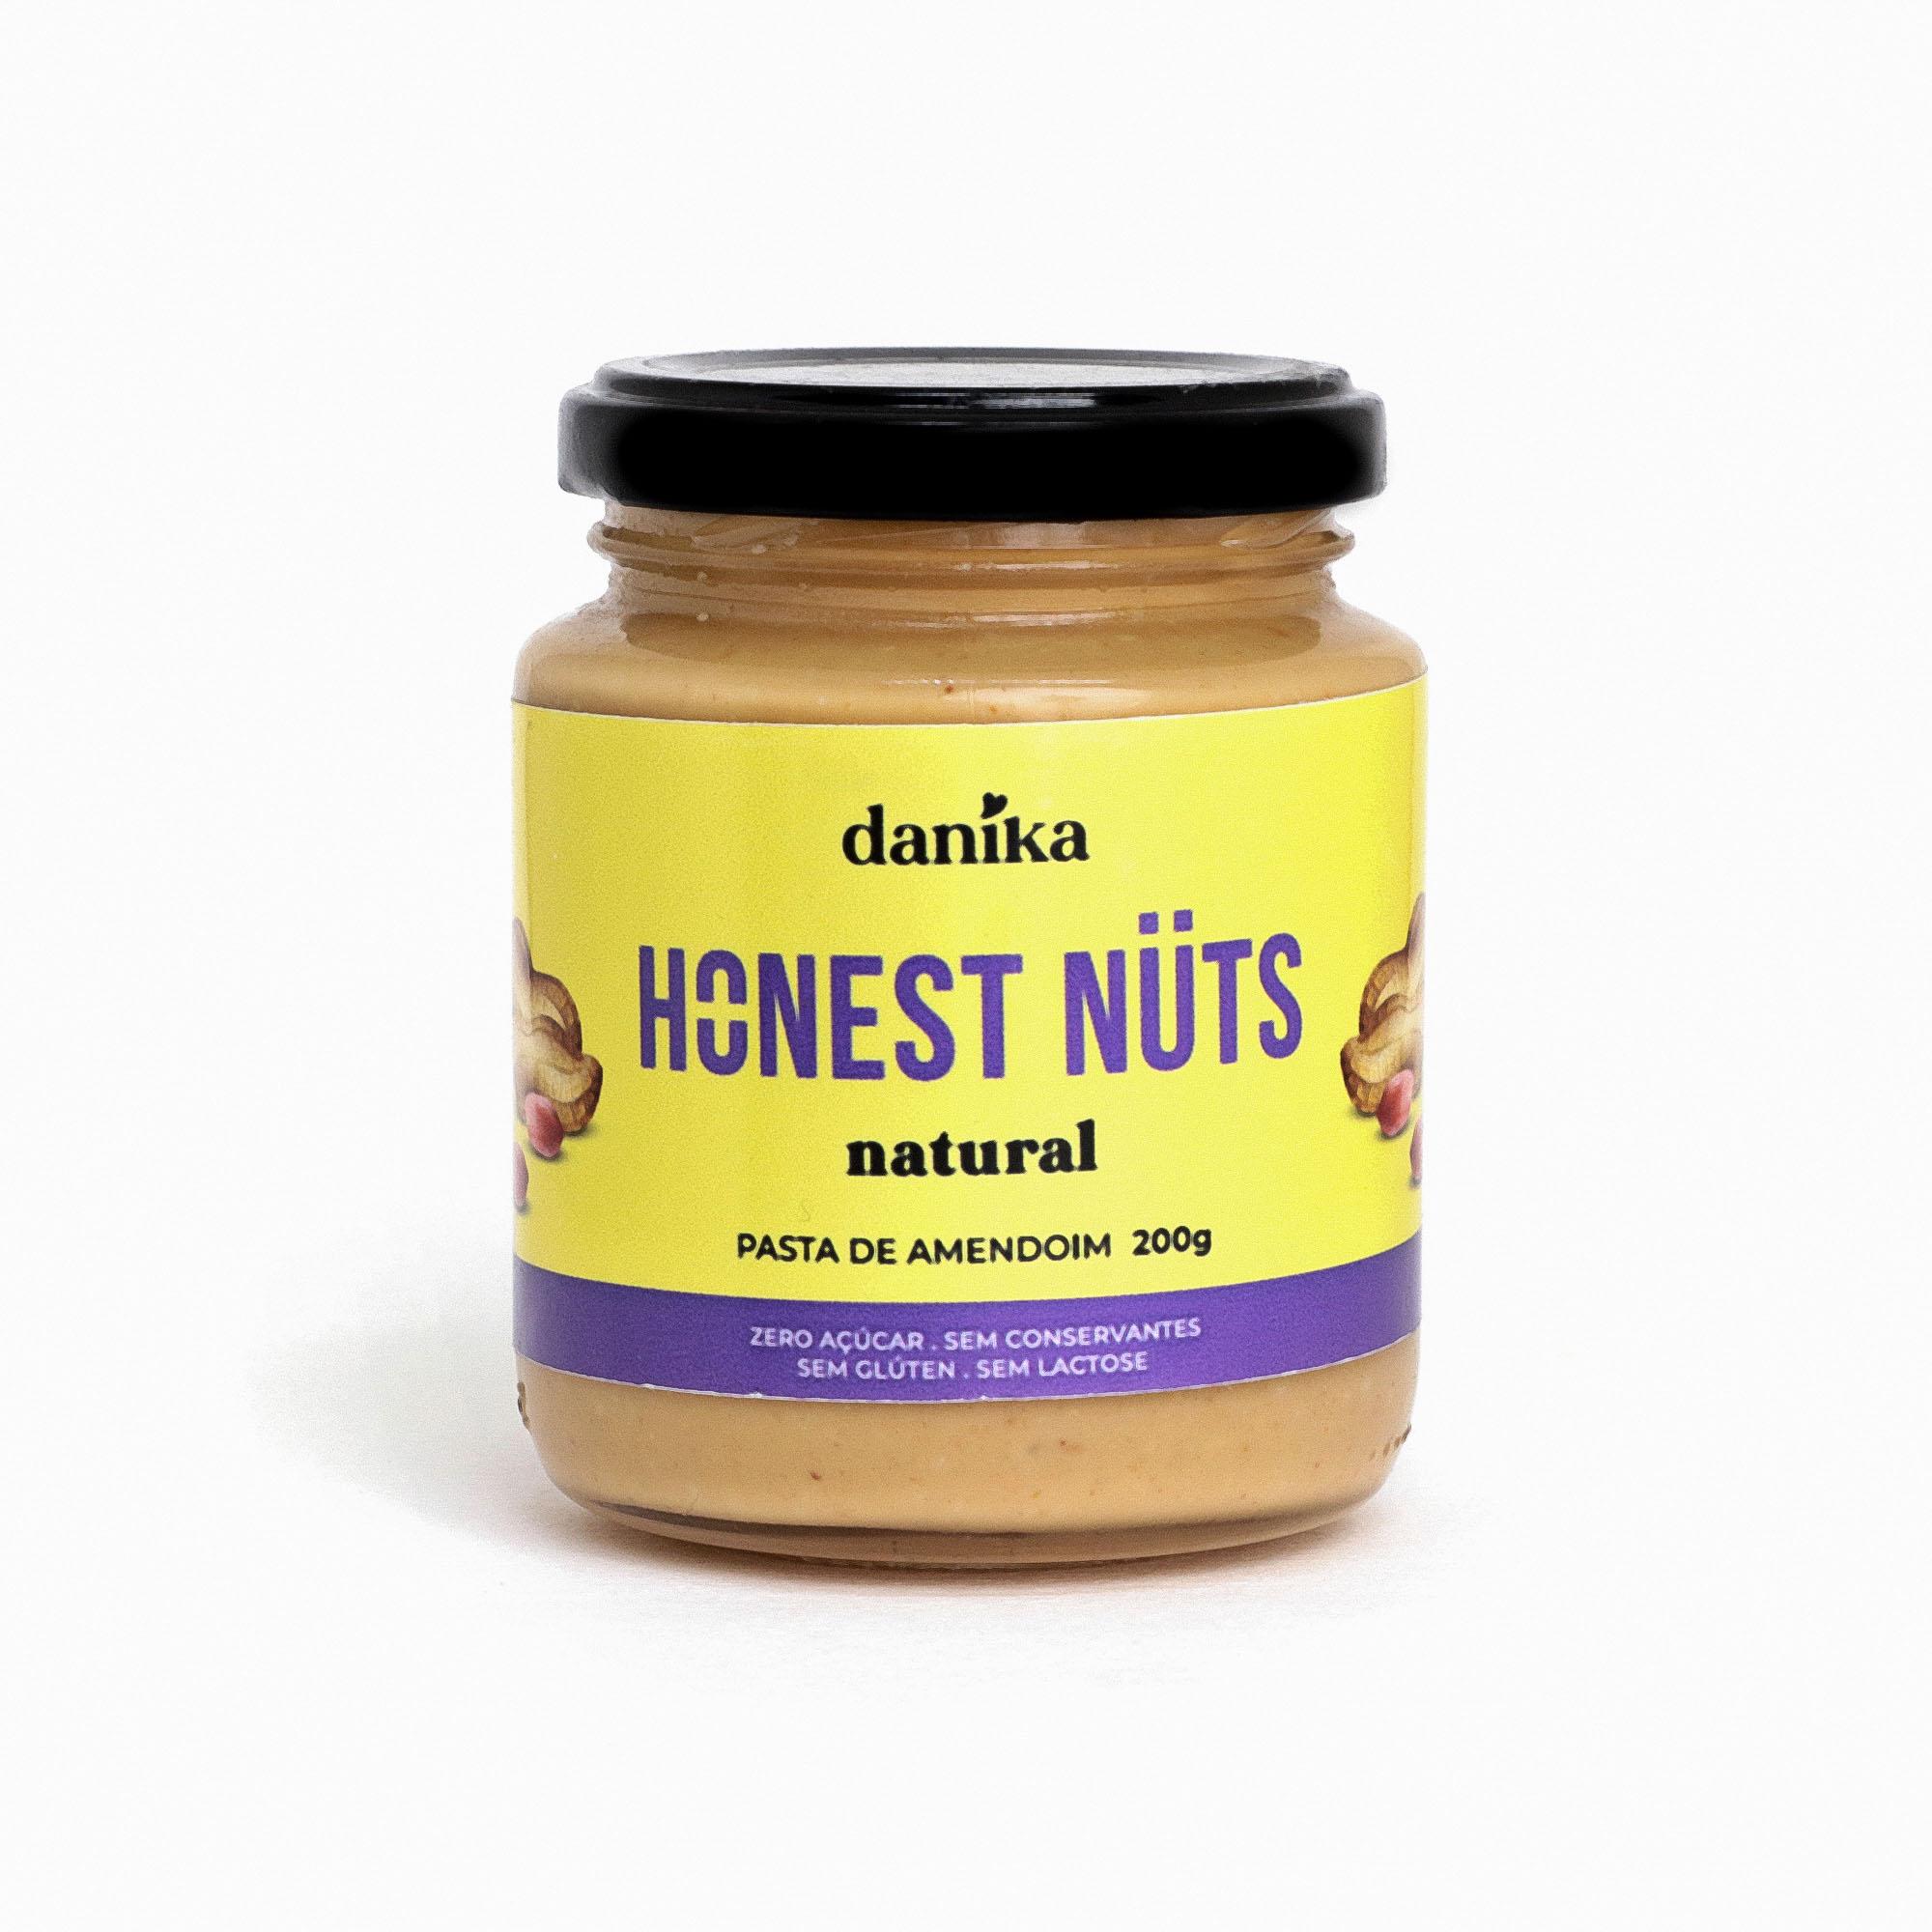 Natural (220g)  - Honest Nuts